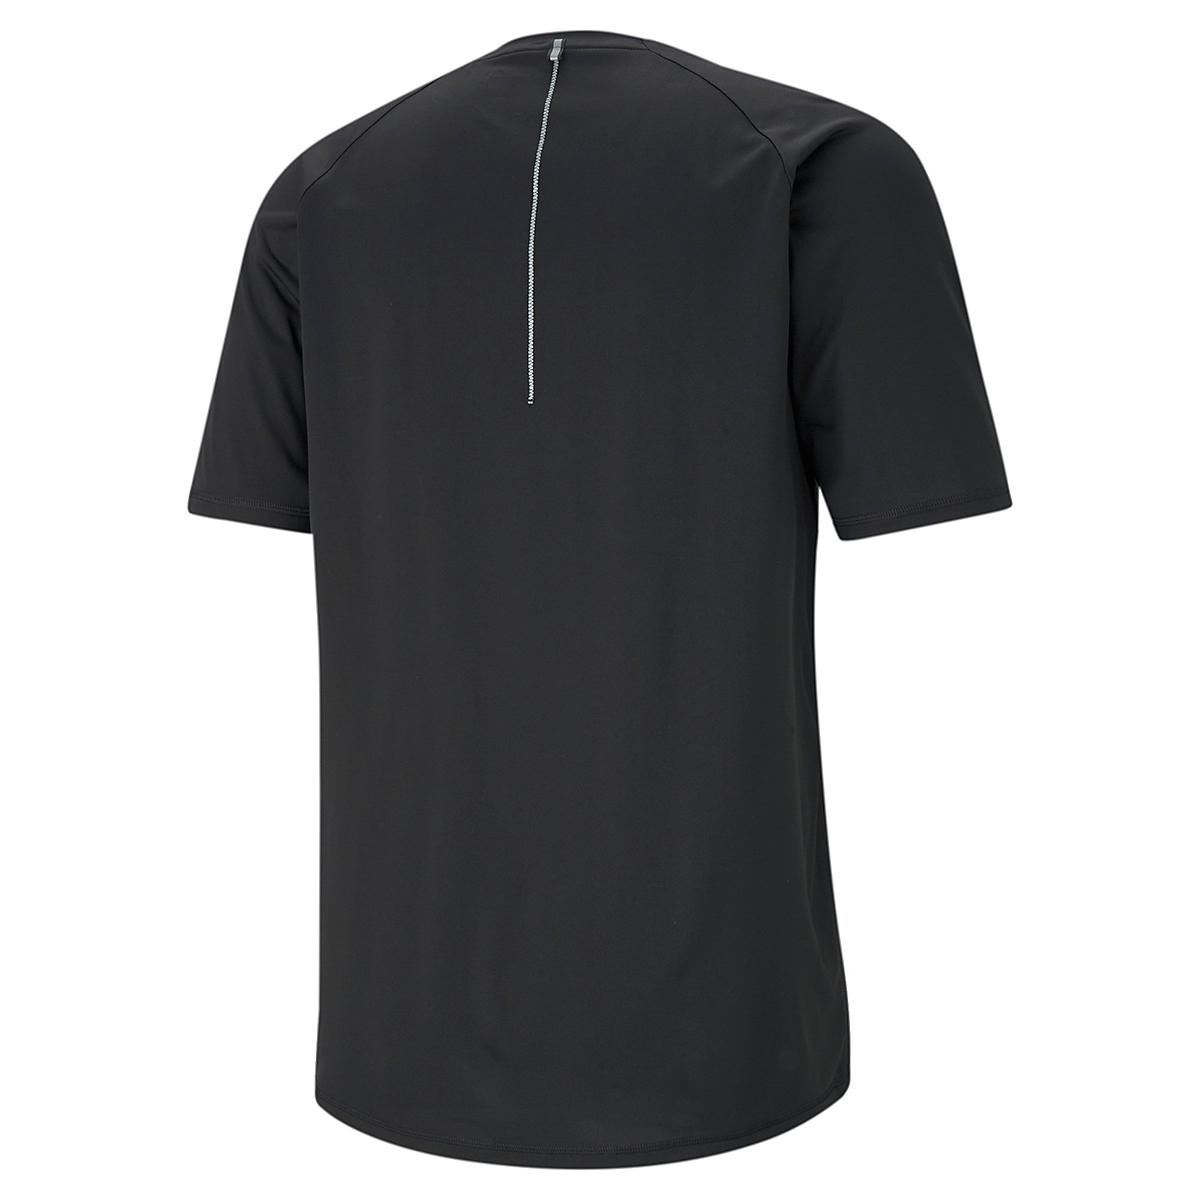 Men's Puma Run Lite COOLadapt Short Sleeve Tee, , large, image 3